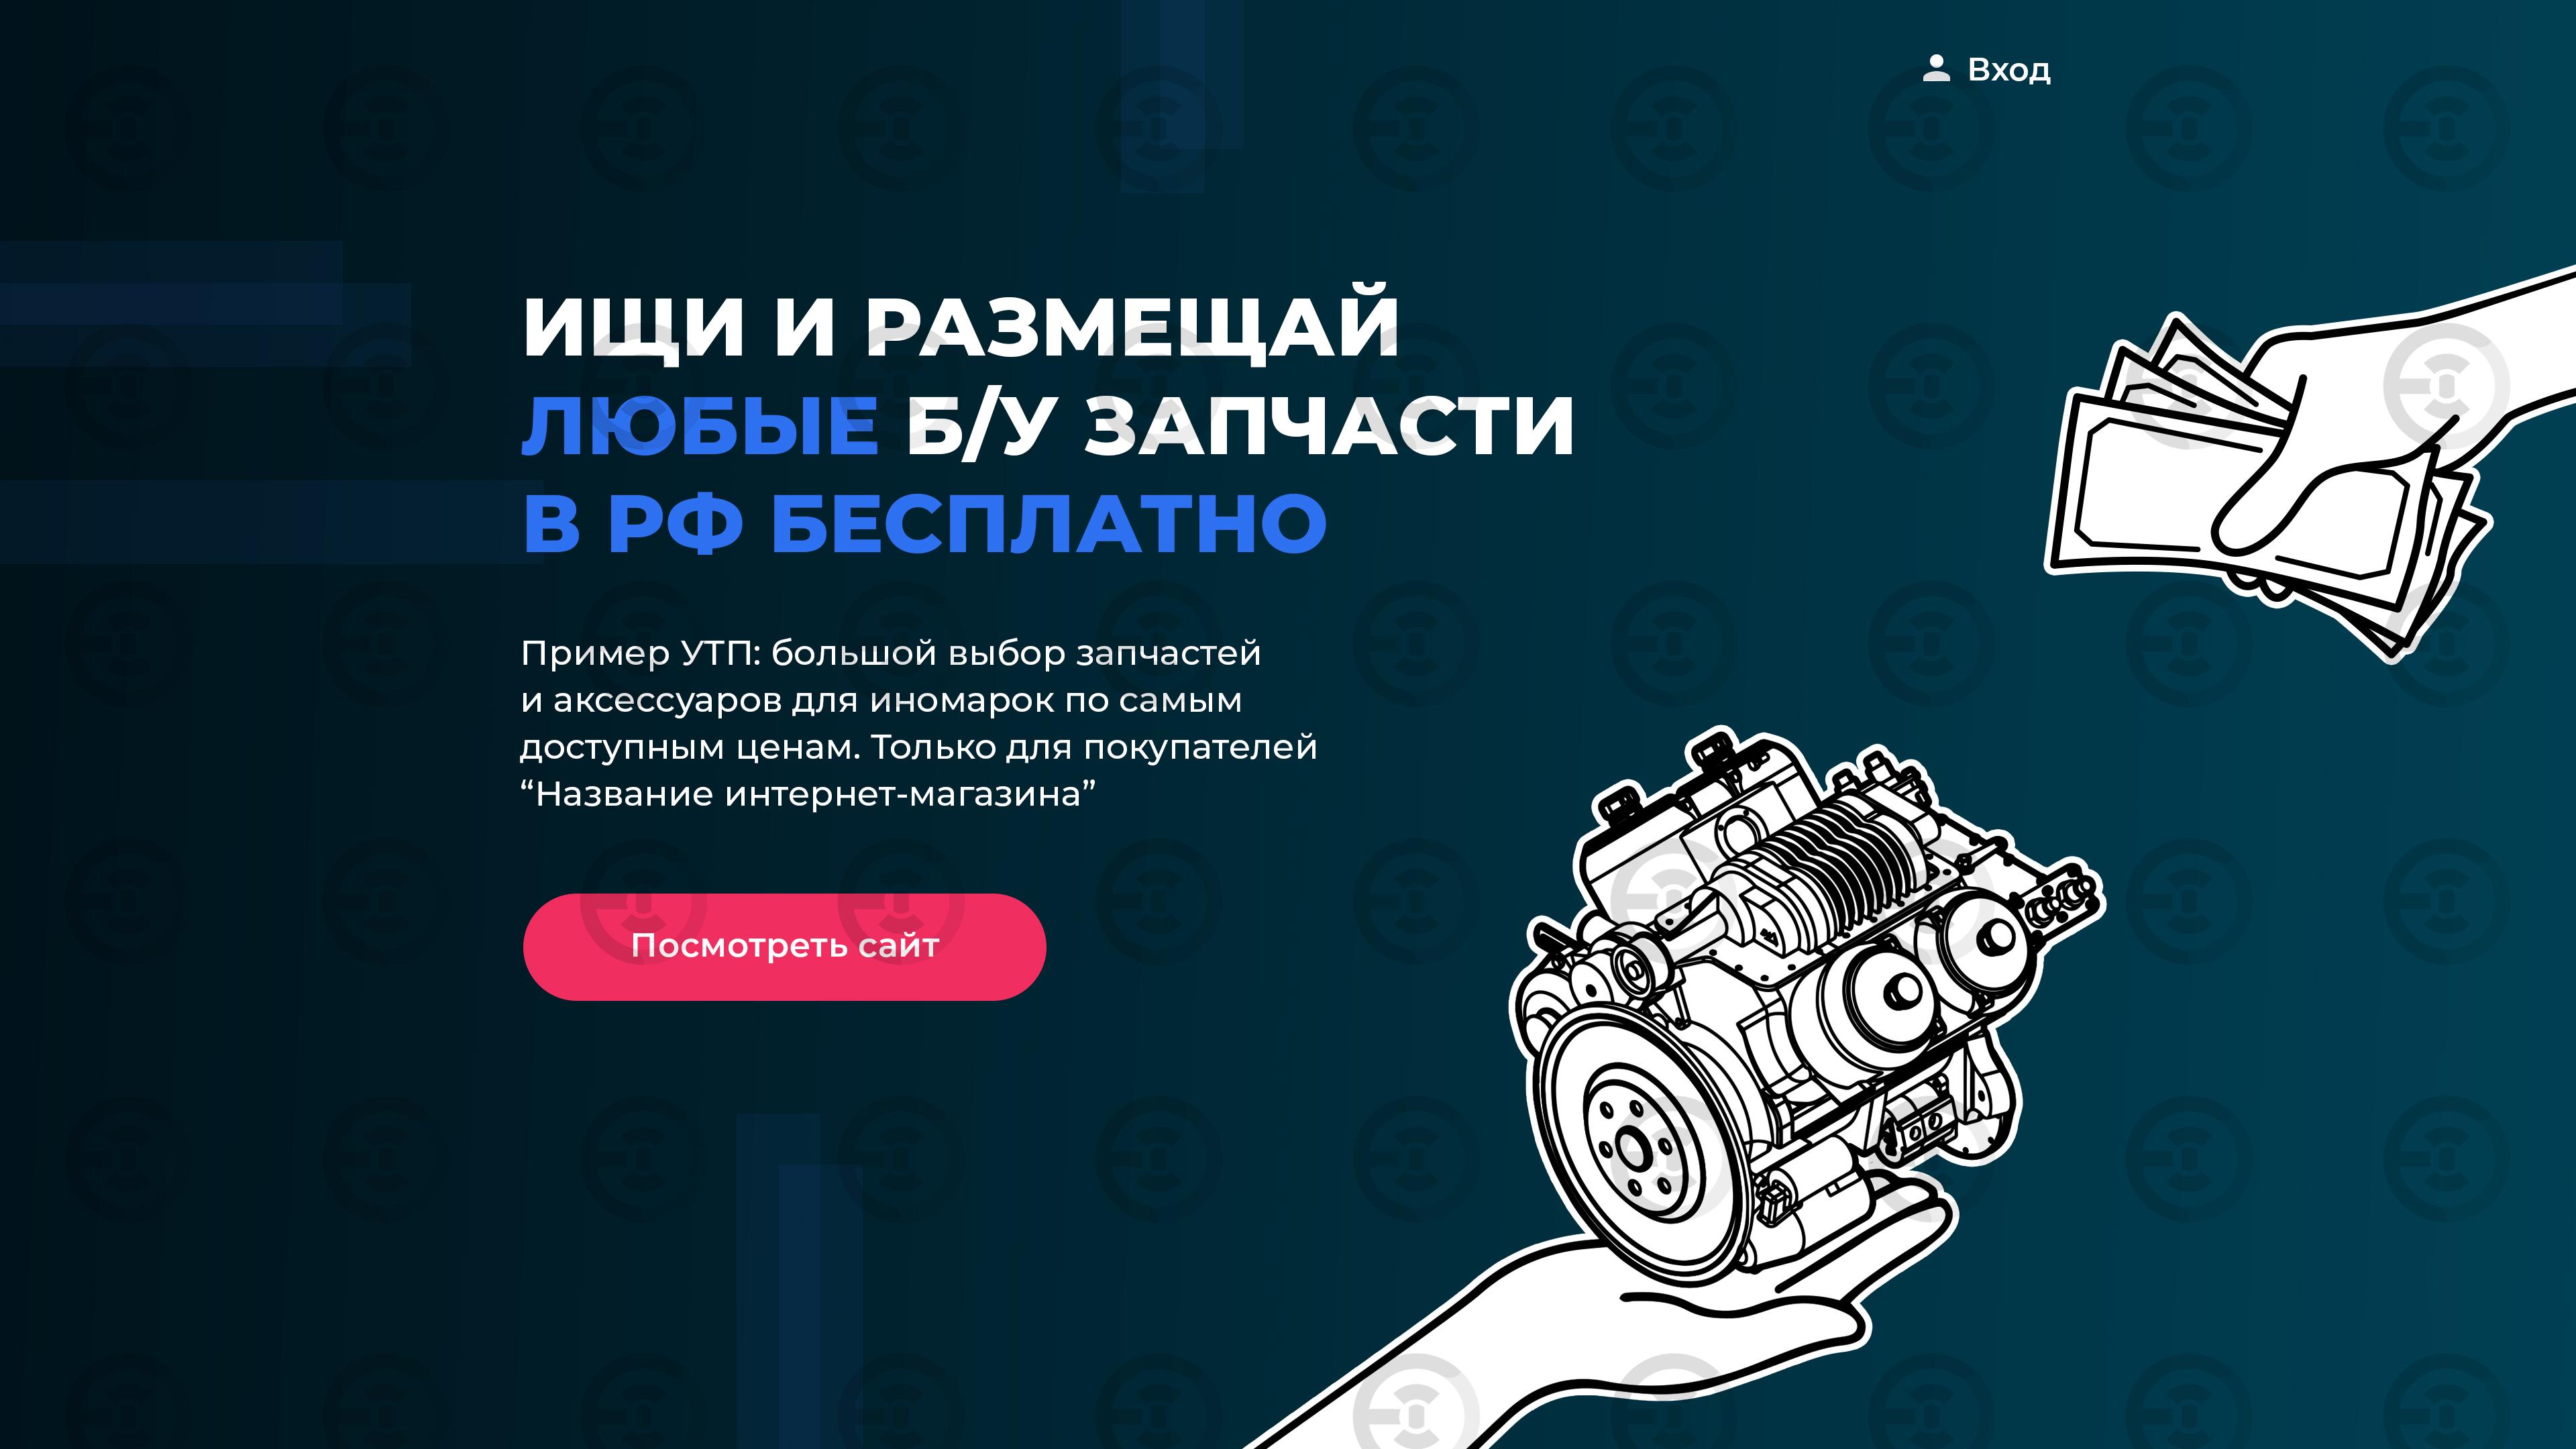 Баннер_i.imgur_UHD_4k_правки_03.jpg